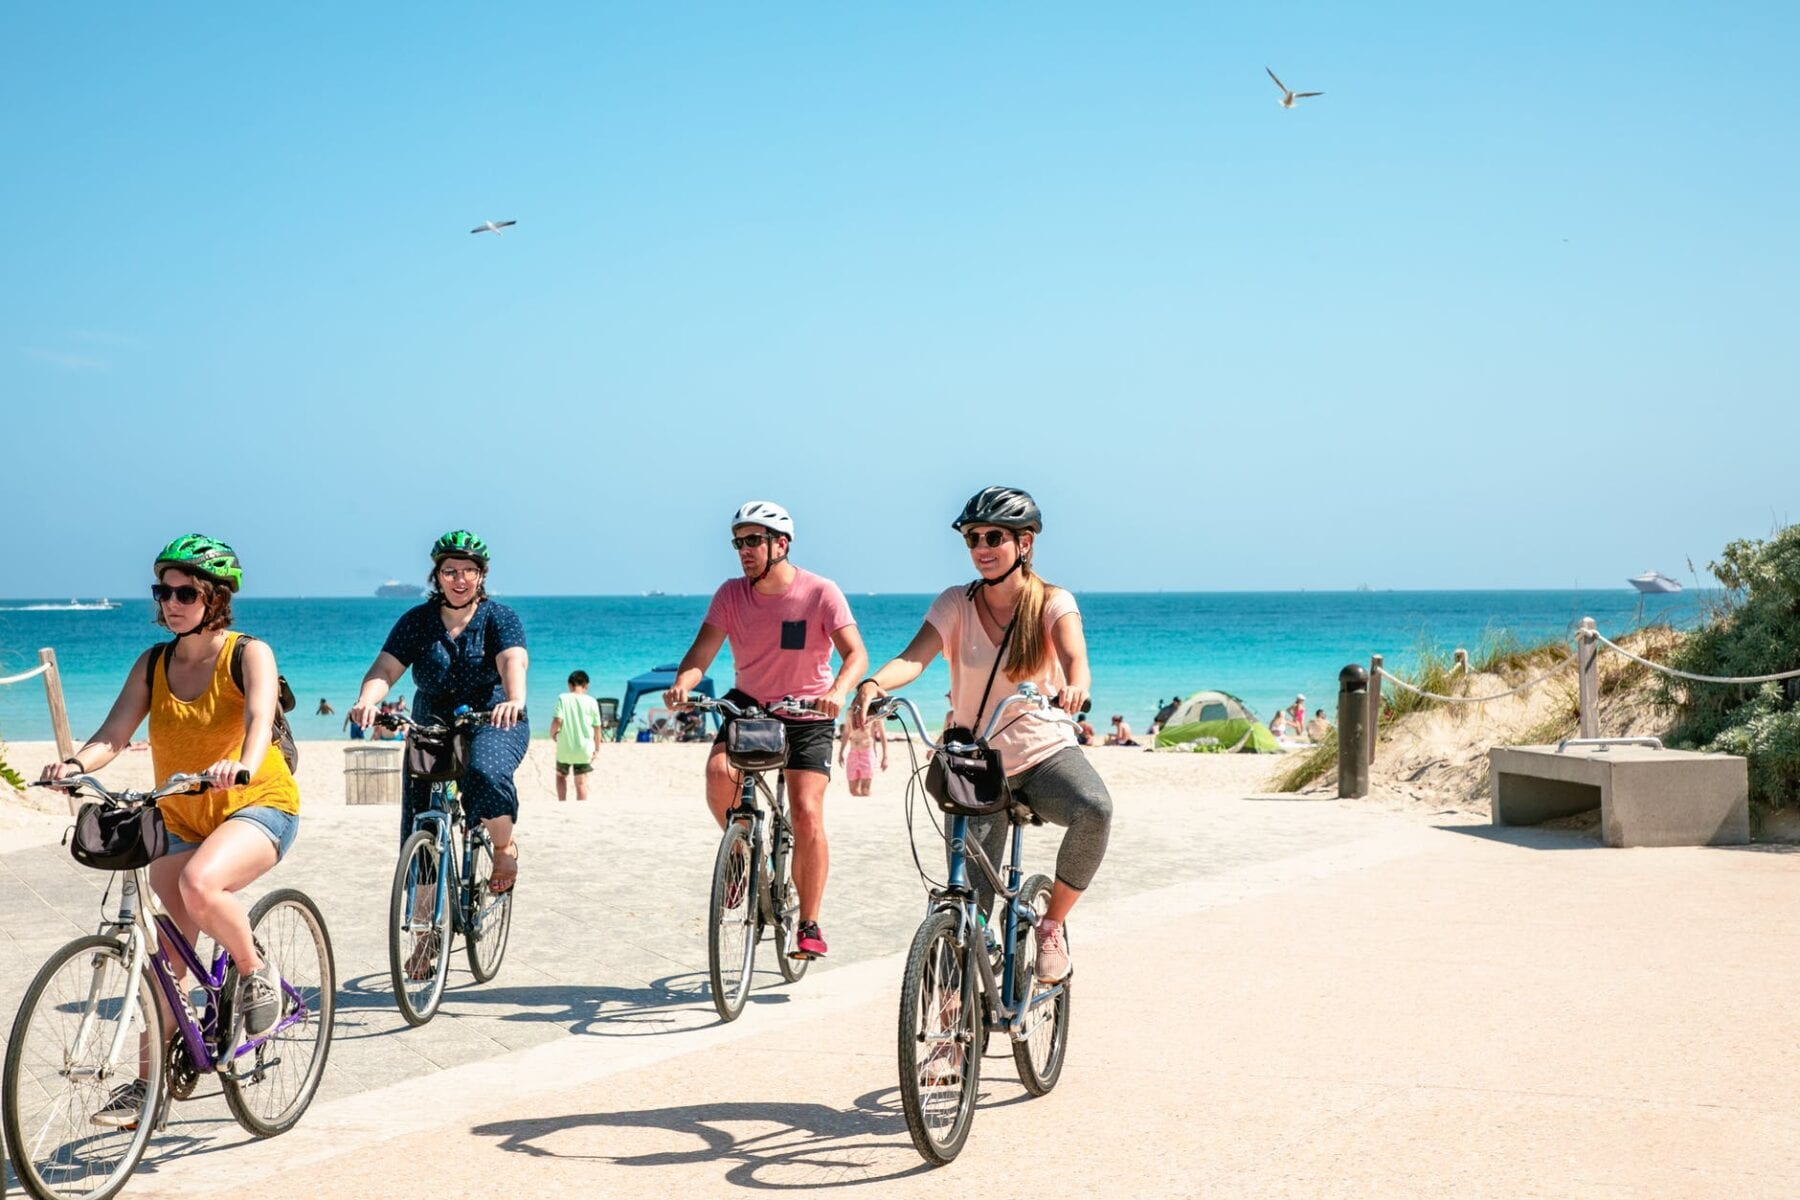 Tourists biking at Miami Beach, United States